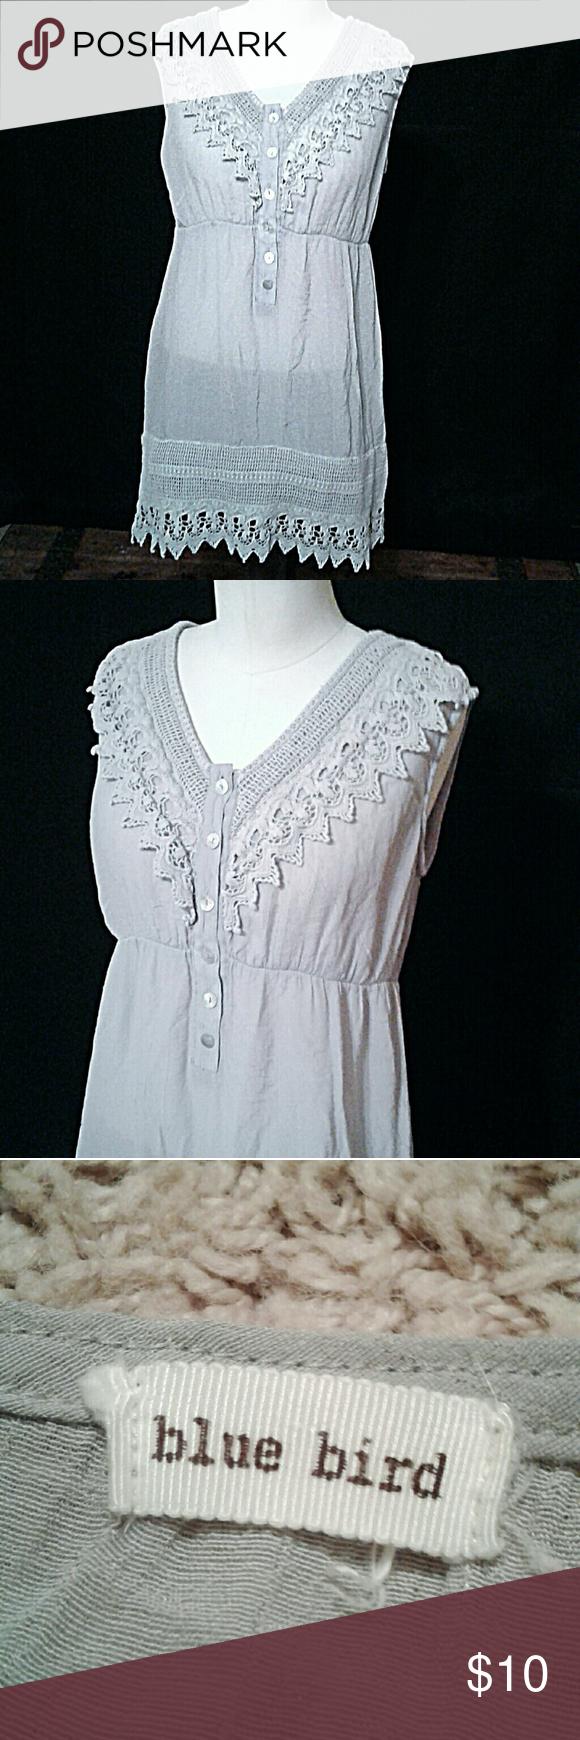 Blue bird sheer gray lace mini dress top tunic l blue bird size